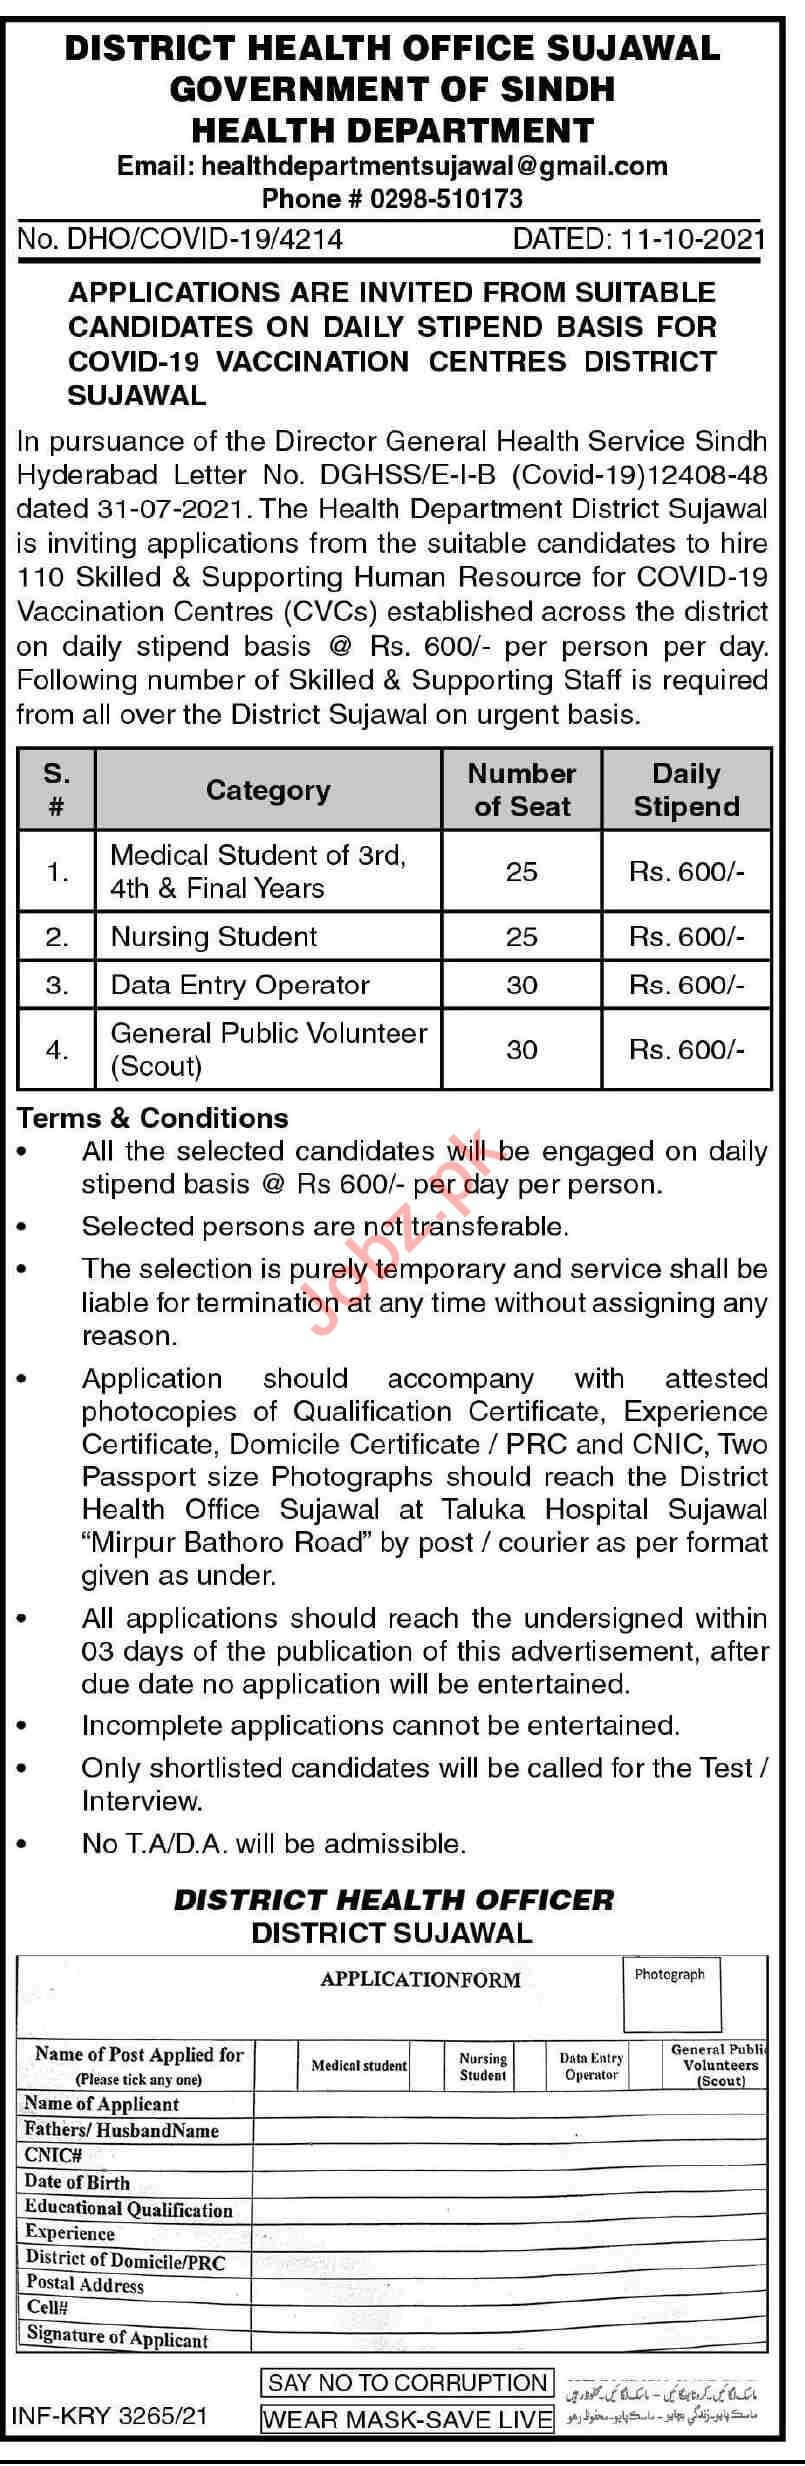 District Health Office Sujawal Jobs 2021 in Pakistan - Sujawal District Jobs 2021